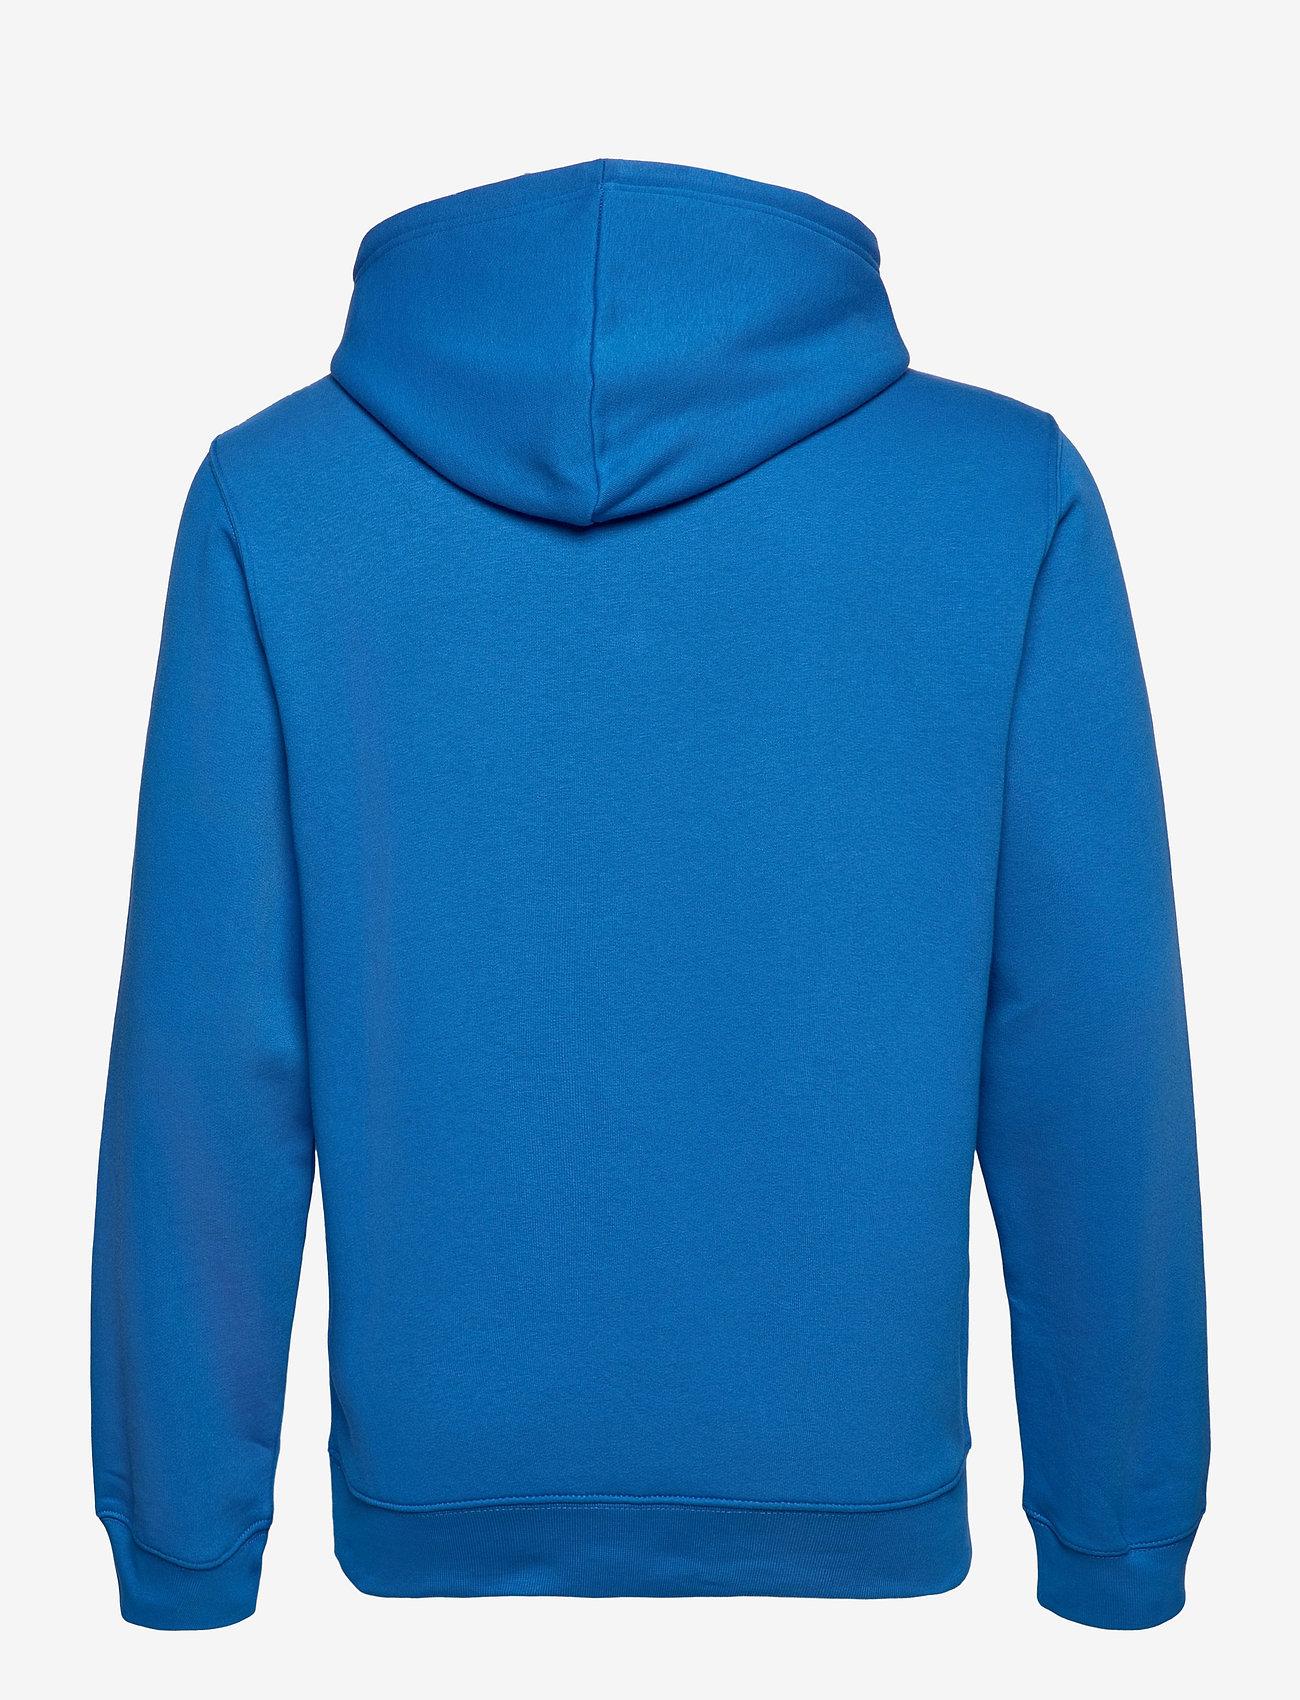 Champion Hooded Sweatshirt - Sweatshirts BALEINE BLUE - Menn Klær